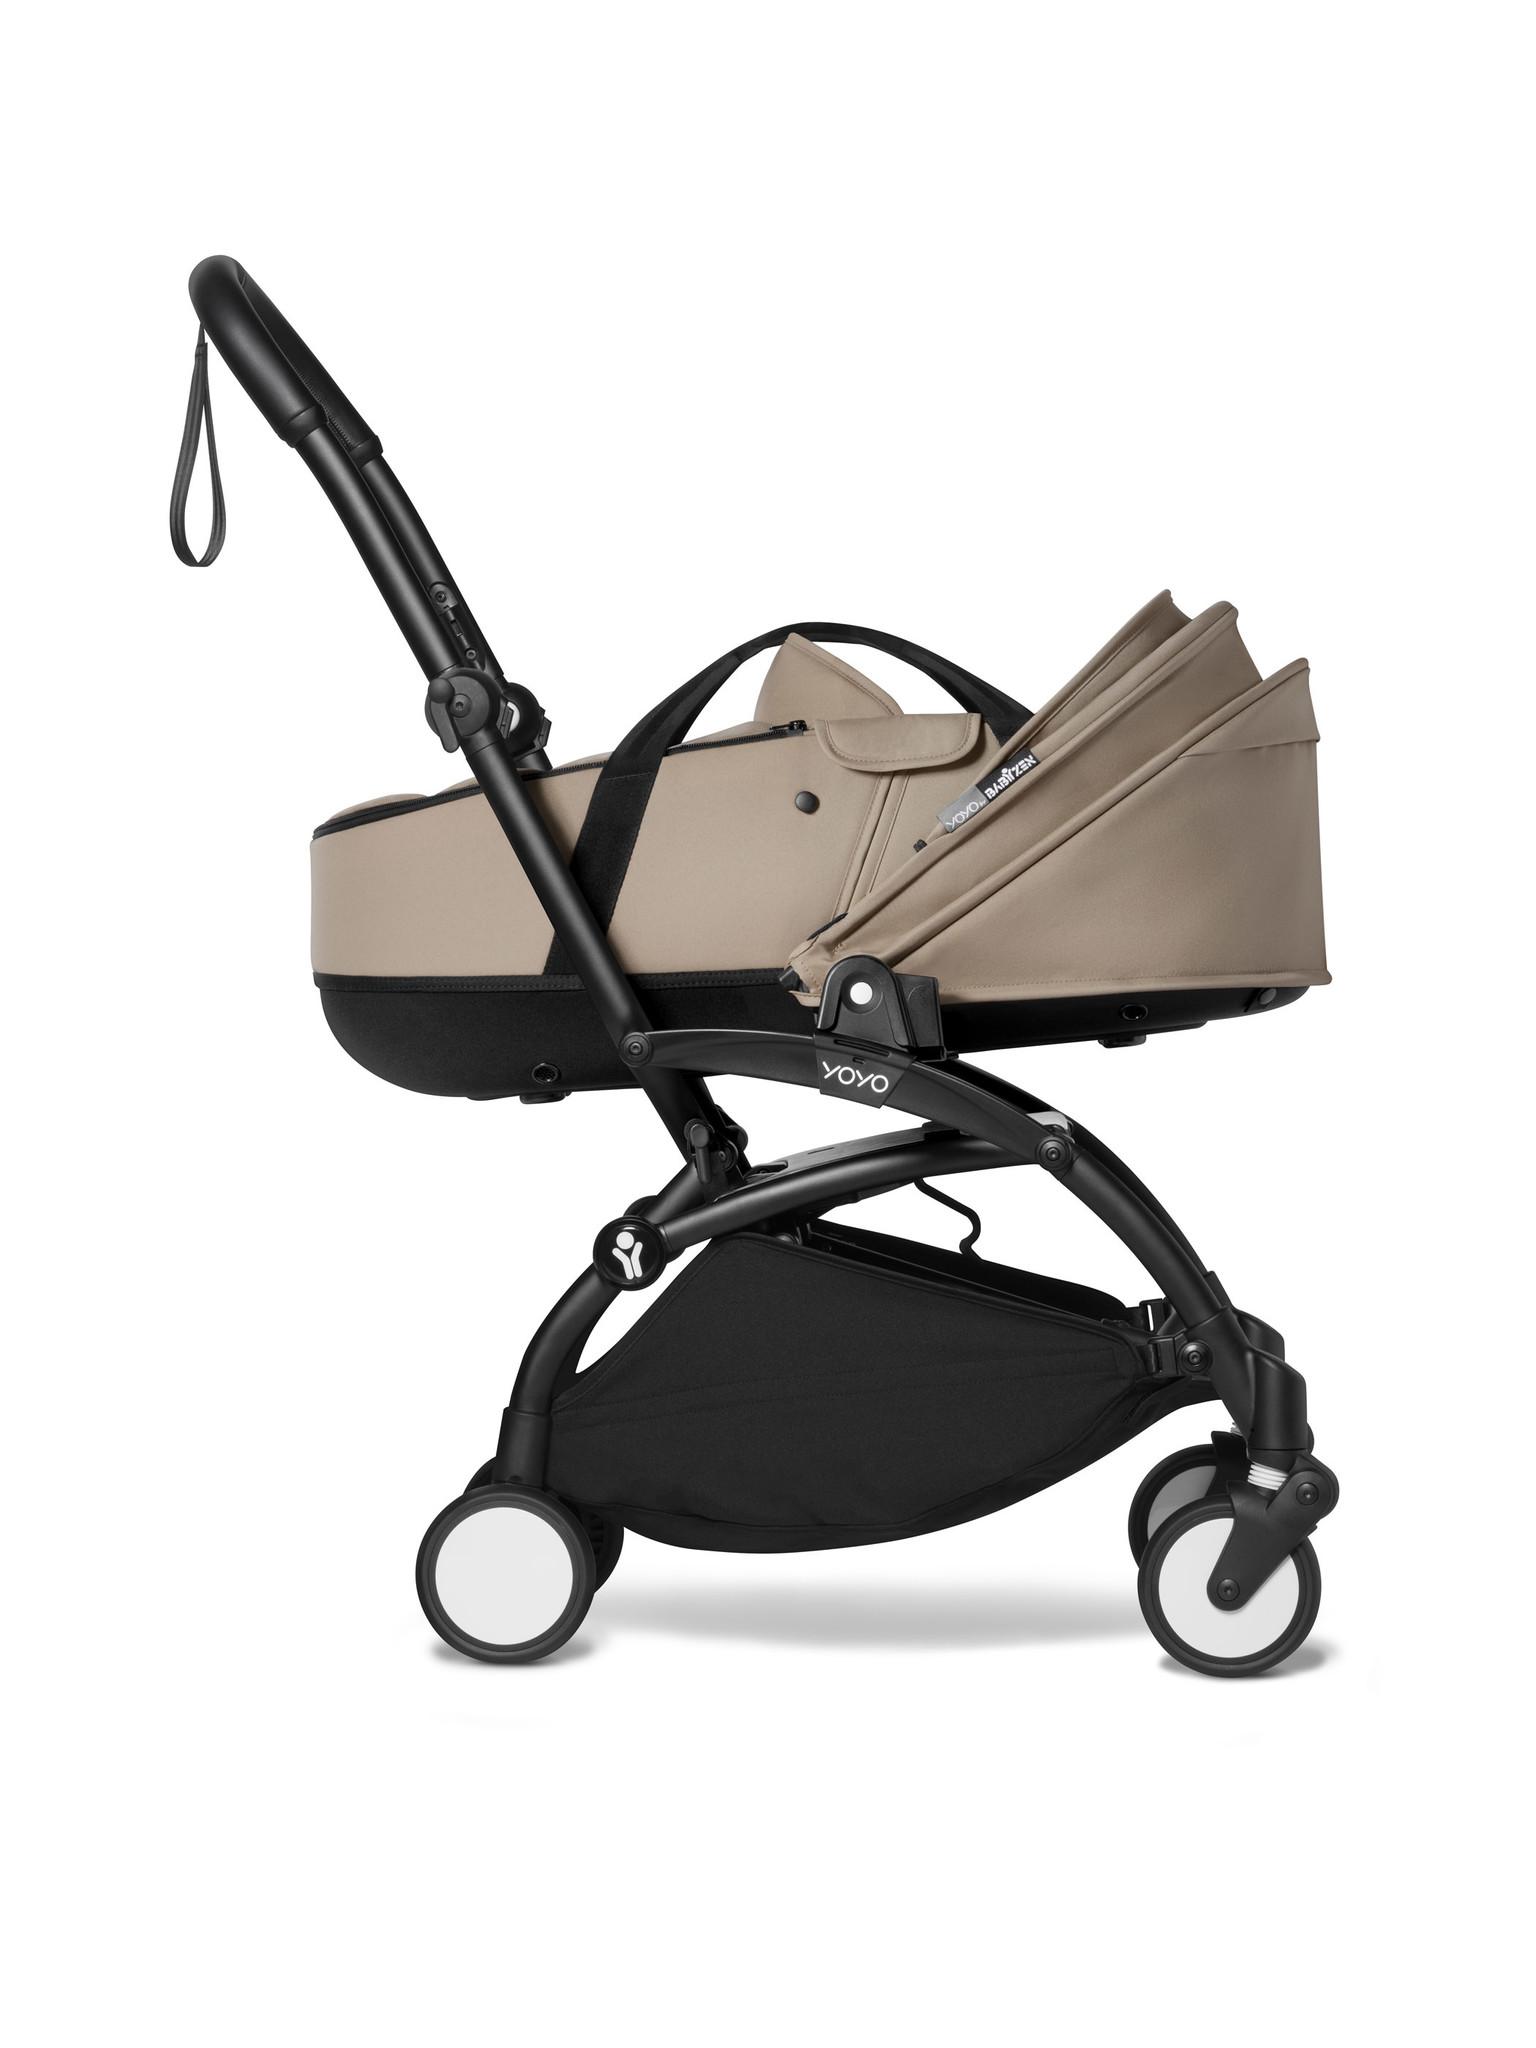 Babyzen Babyzen YOYO² schwarzer Rahmen mit YOYO Stubenwagen - Tragetasche - Taupe